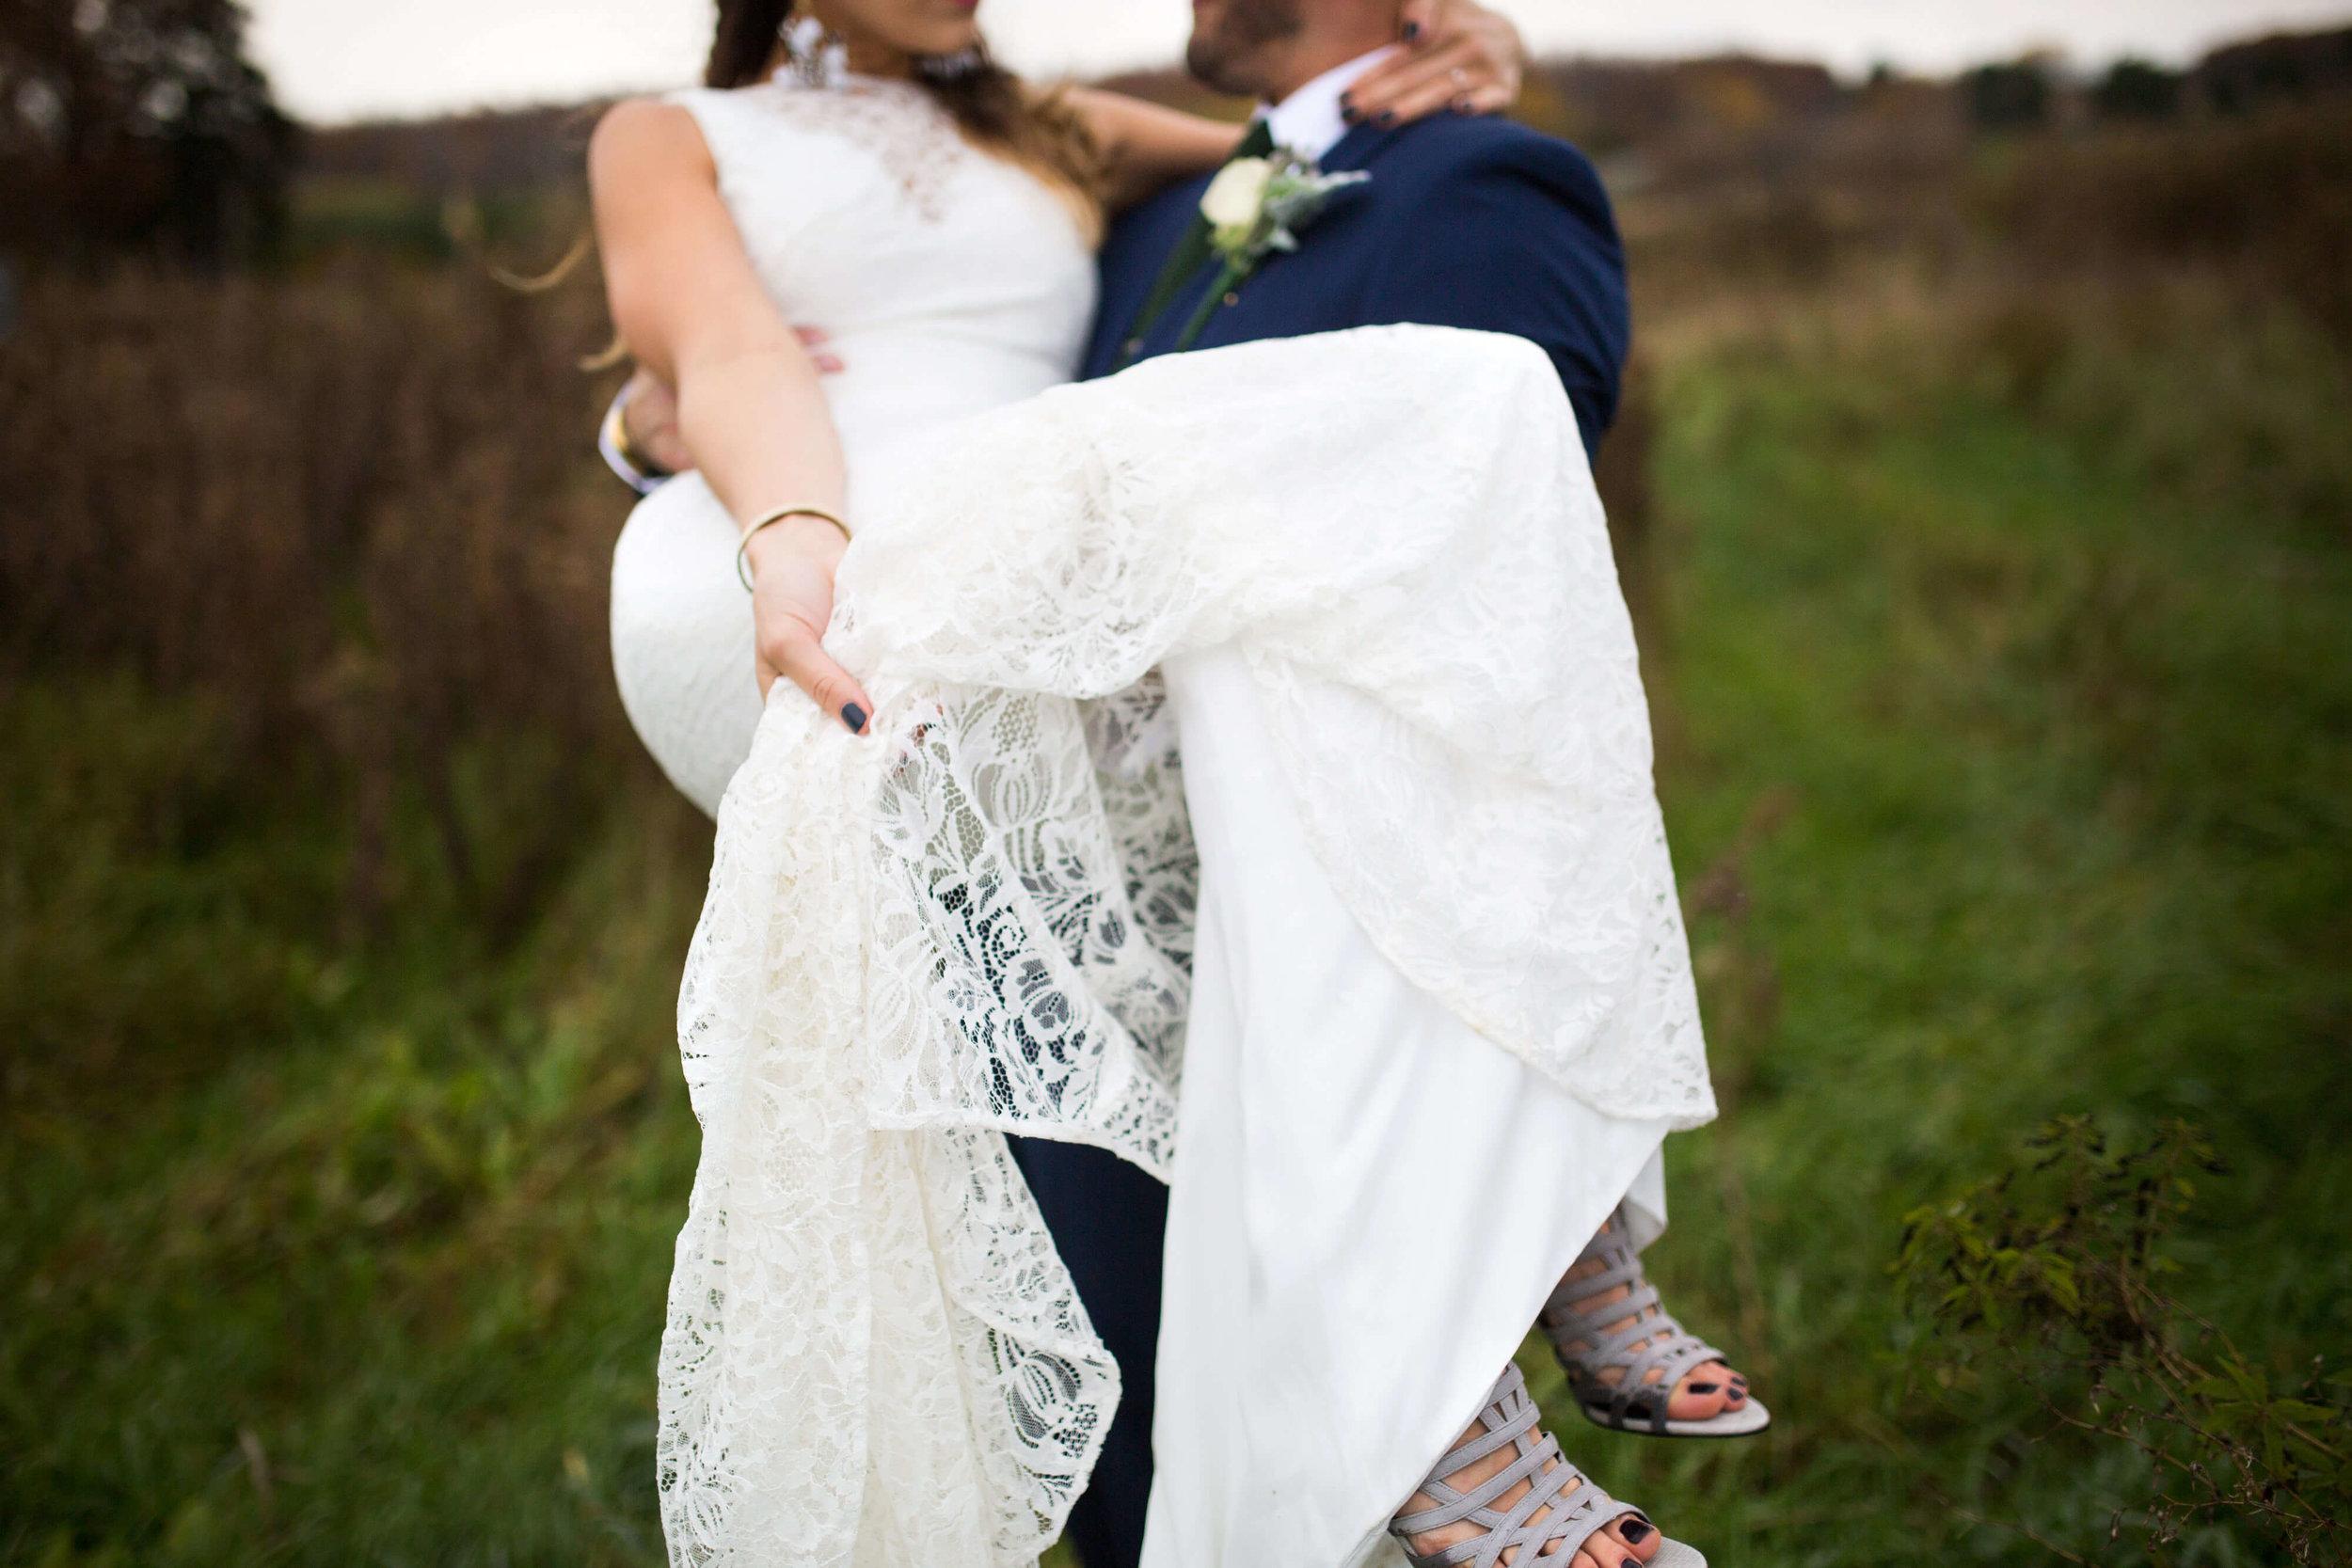 groom carrying bride | Minnesota wedding photographer Studio KH wedding dress details | wedding blog | Sixpence Events 70 Ways to Photograph Your Wedding Dress.jpg